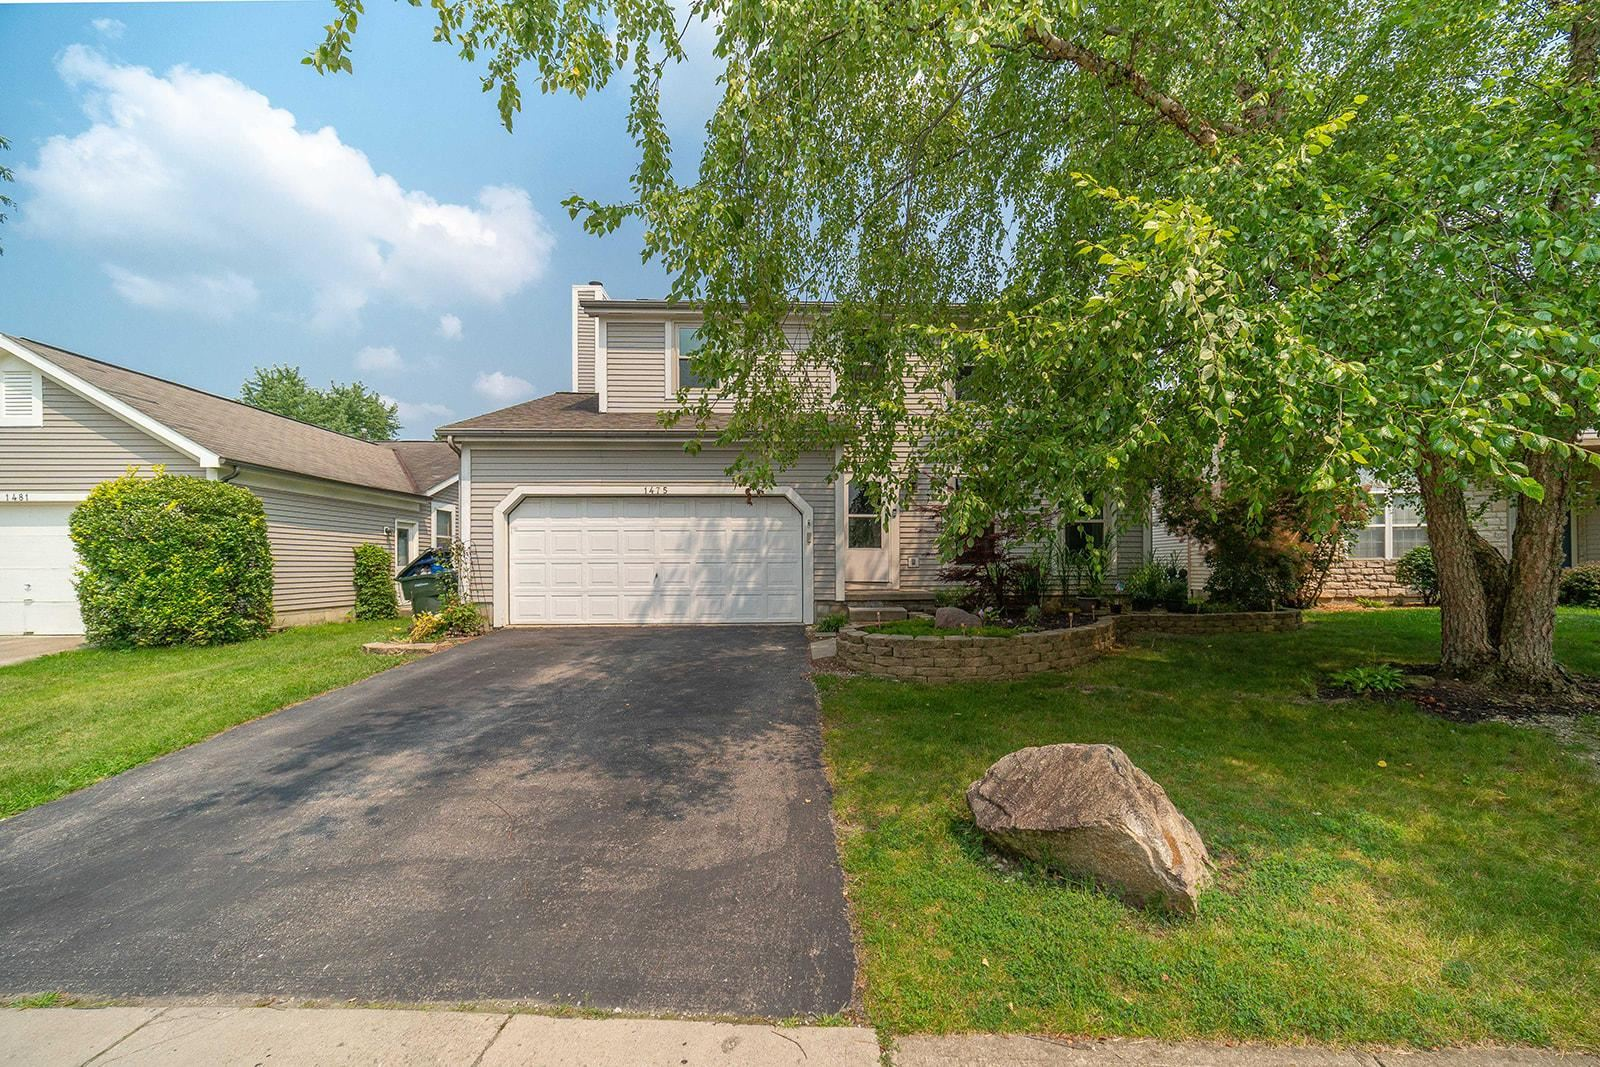 Photo of 1475 Clovenstone Drive, Worthington, OH 43085 (MLS # 221027995)